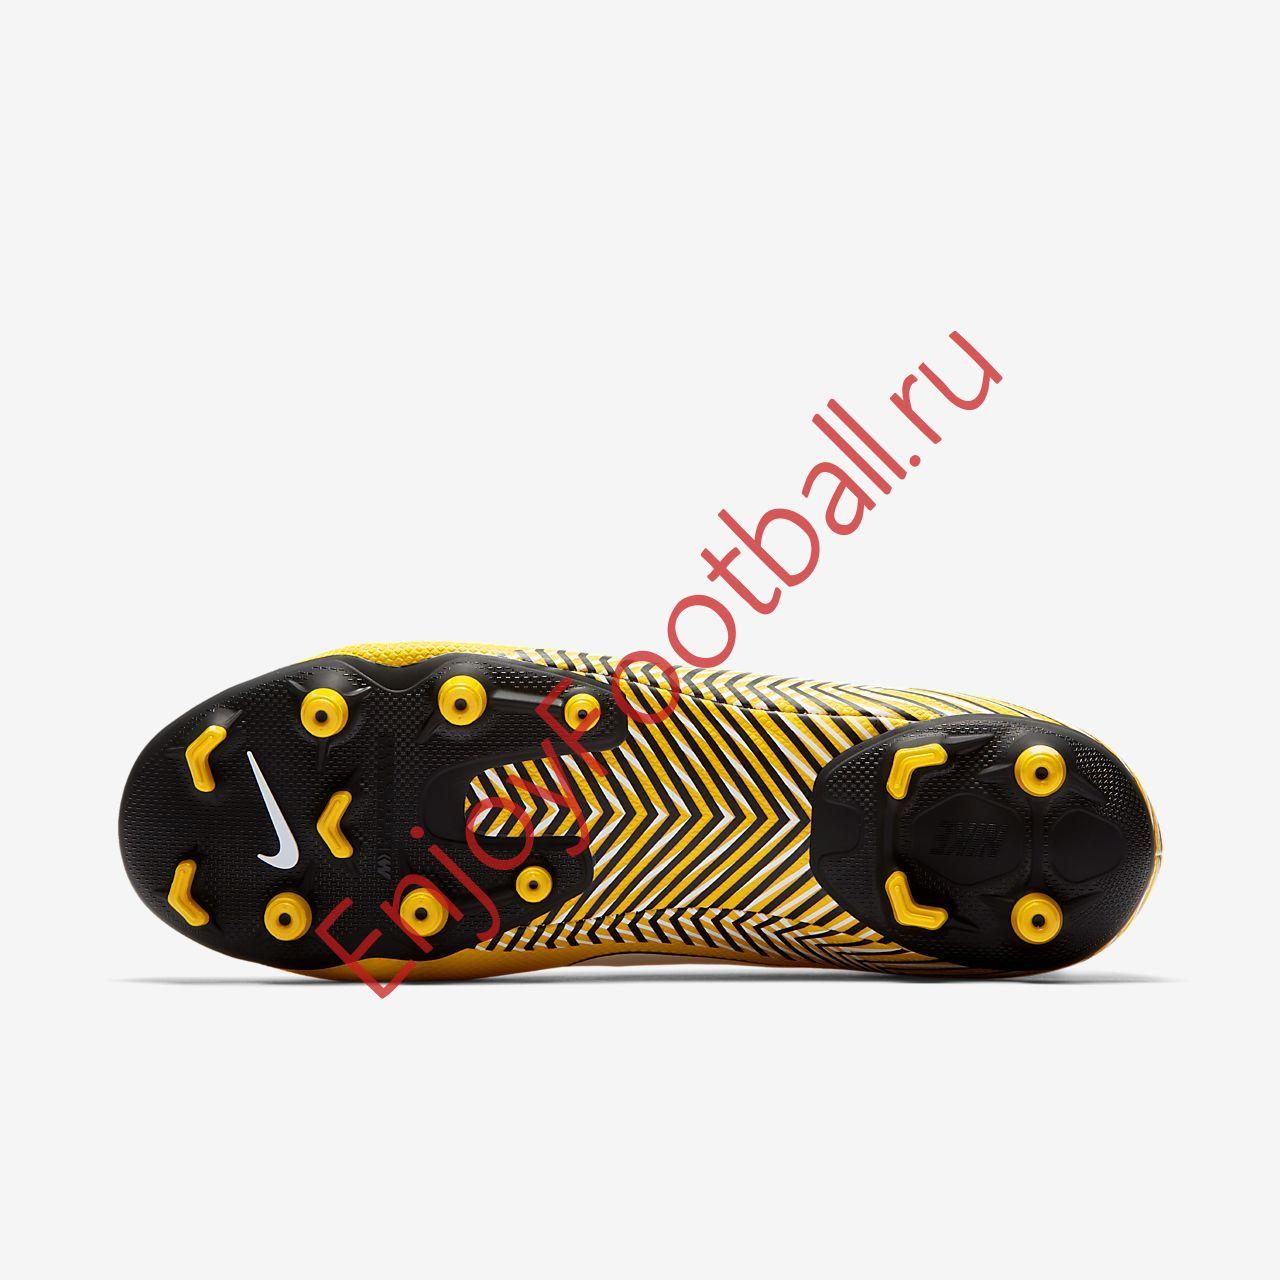 on sale 2d551 7fd94 Бутсы NIKE SUPERFLY 6 ACADEMY NJR FG/MG AO9466-710 SR